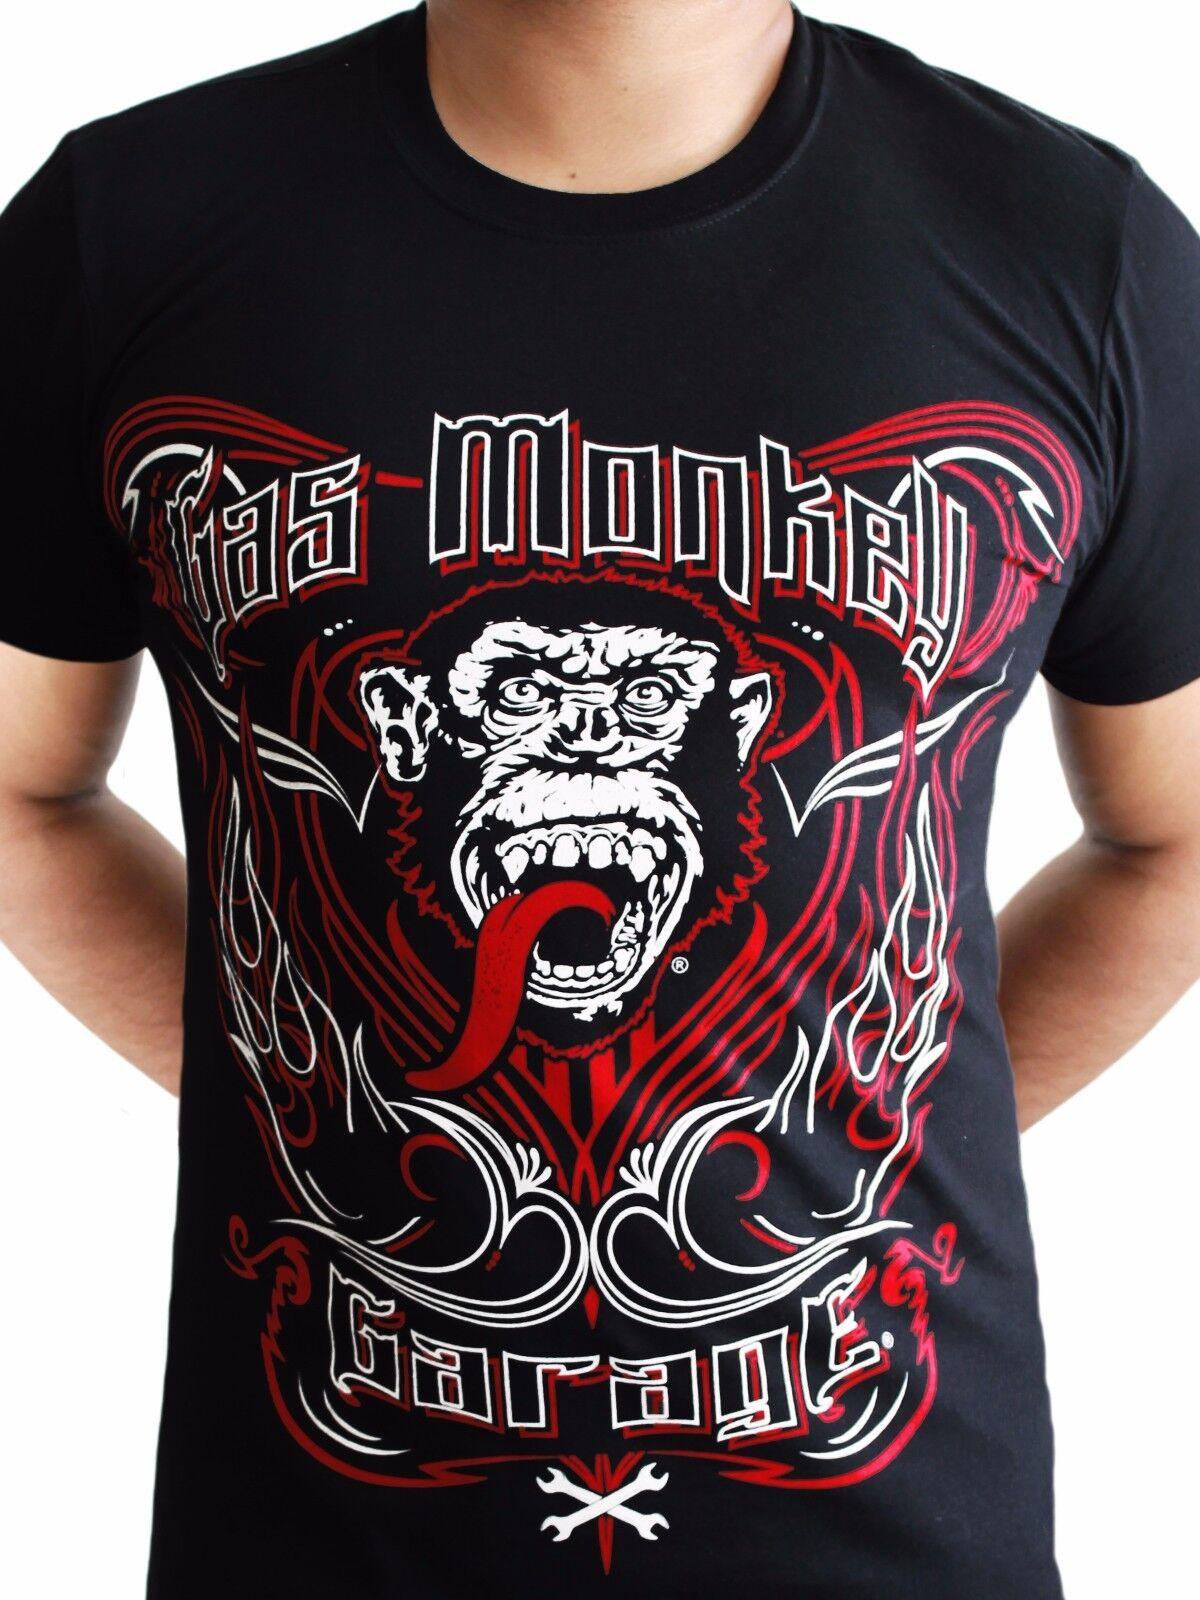 9a8cd8f6ffd Gas Monkey Garage Tattoo Keyline GMG Kustom Builds Licensed Black Mens  T-shirt